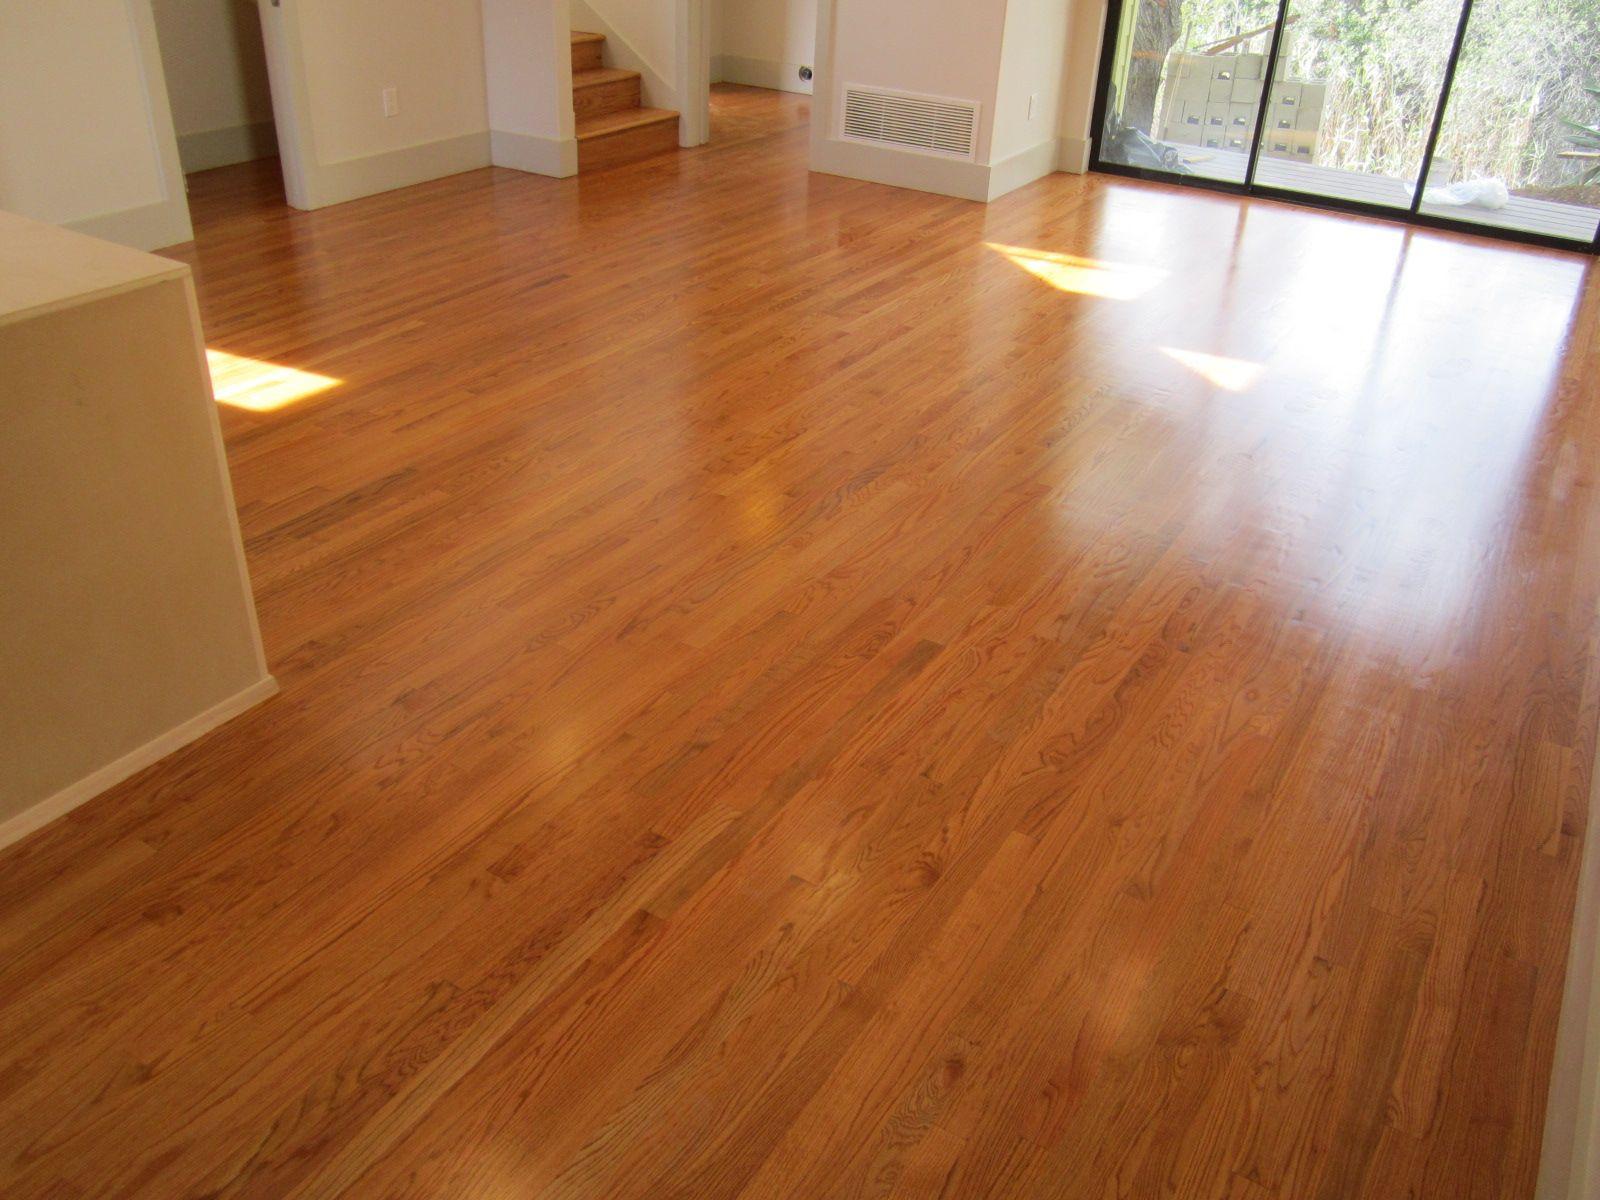 cost to refinish hardwood floors per sq ft of cost to refinish hardwood floors floor plan ideas within cost to refinish hardwood floors concrete tom tarrant space ideas pinterest